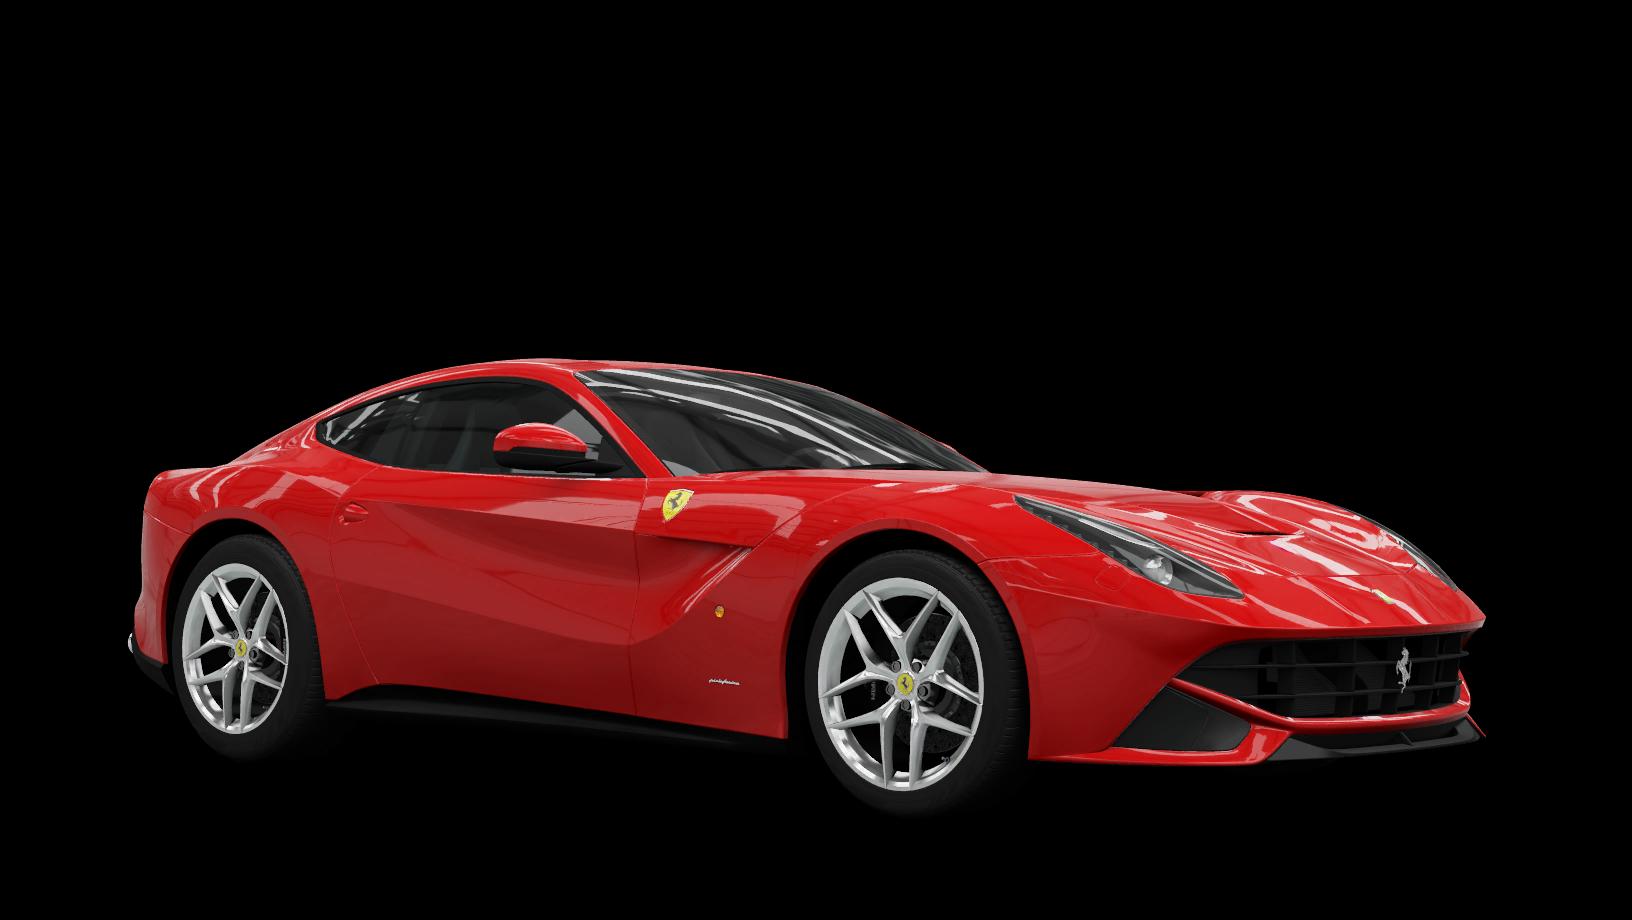 Ferrari F12berlinetta Forza Wiki Fandom